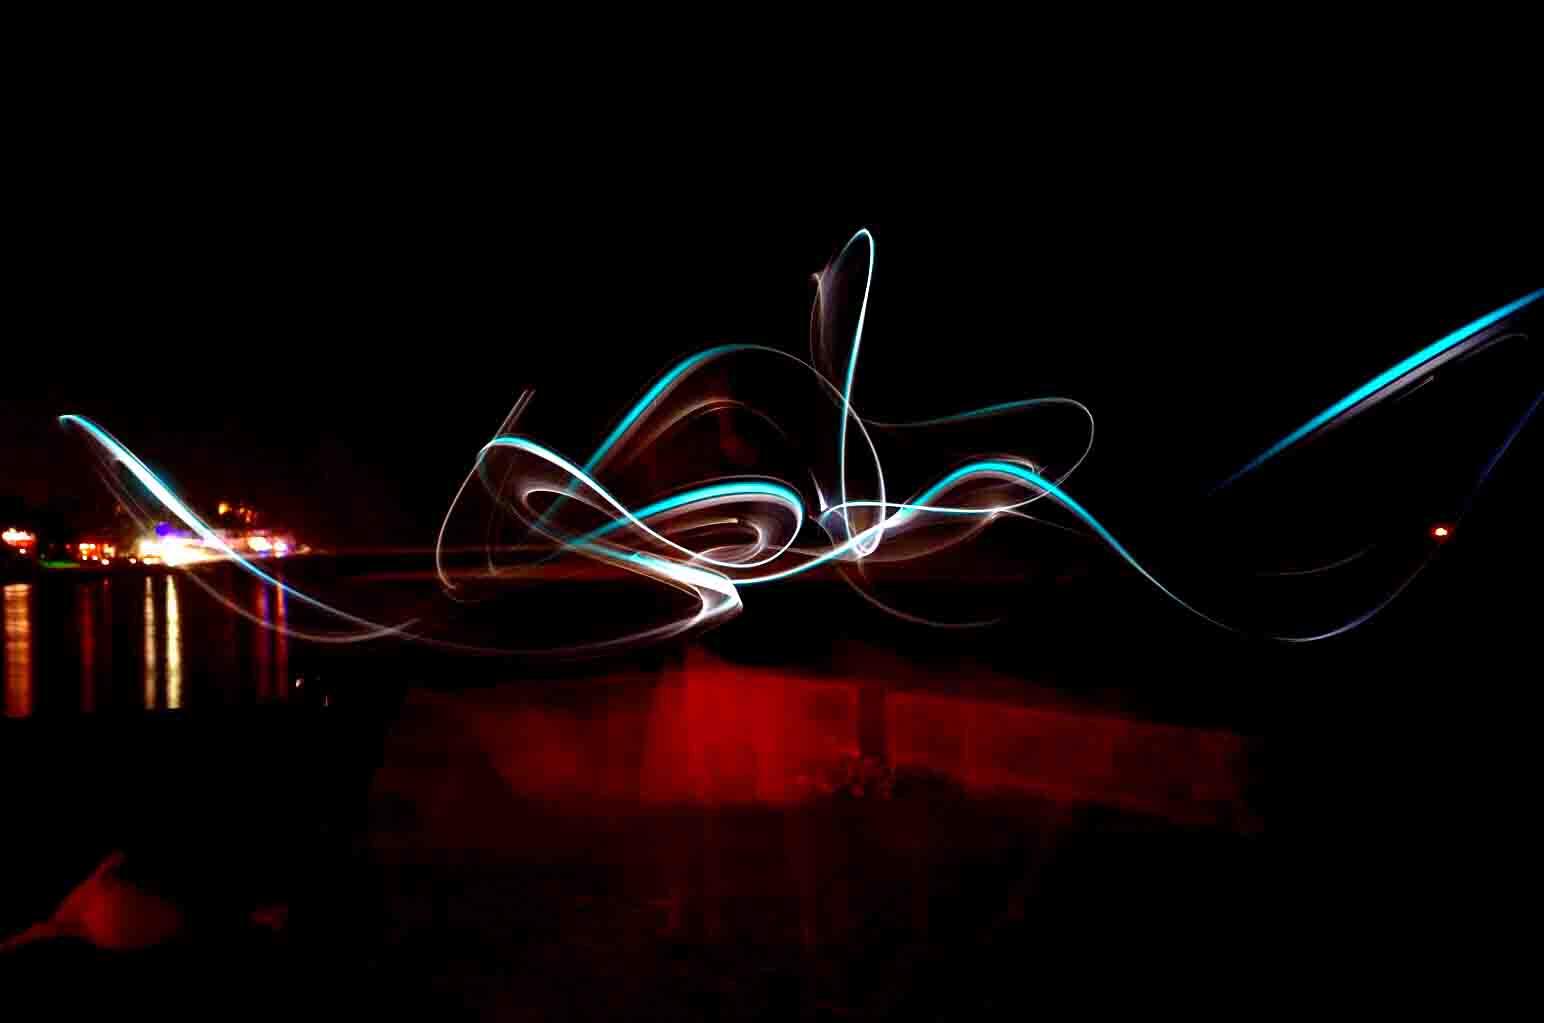 sbcltr-11-danielsun-lightpainting2